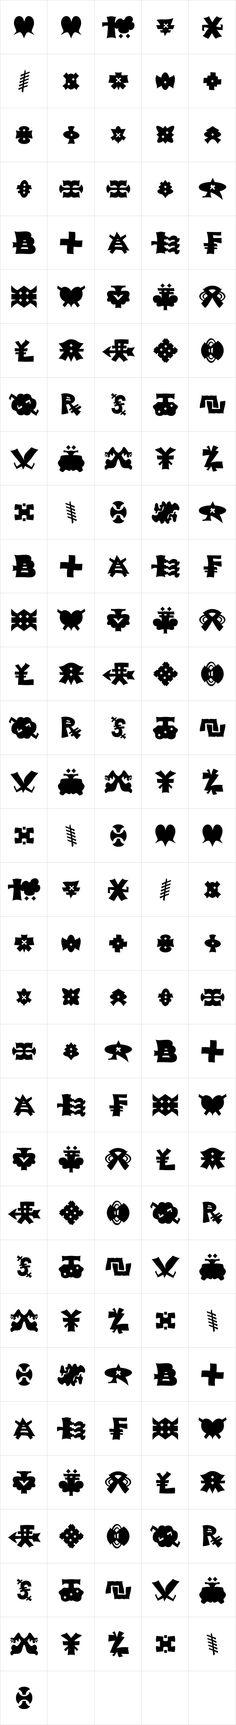 Alien by ParaType - Desktop Font and WebFont - YouWorkForThem